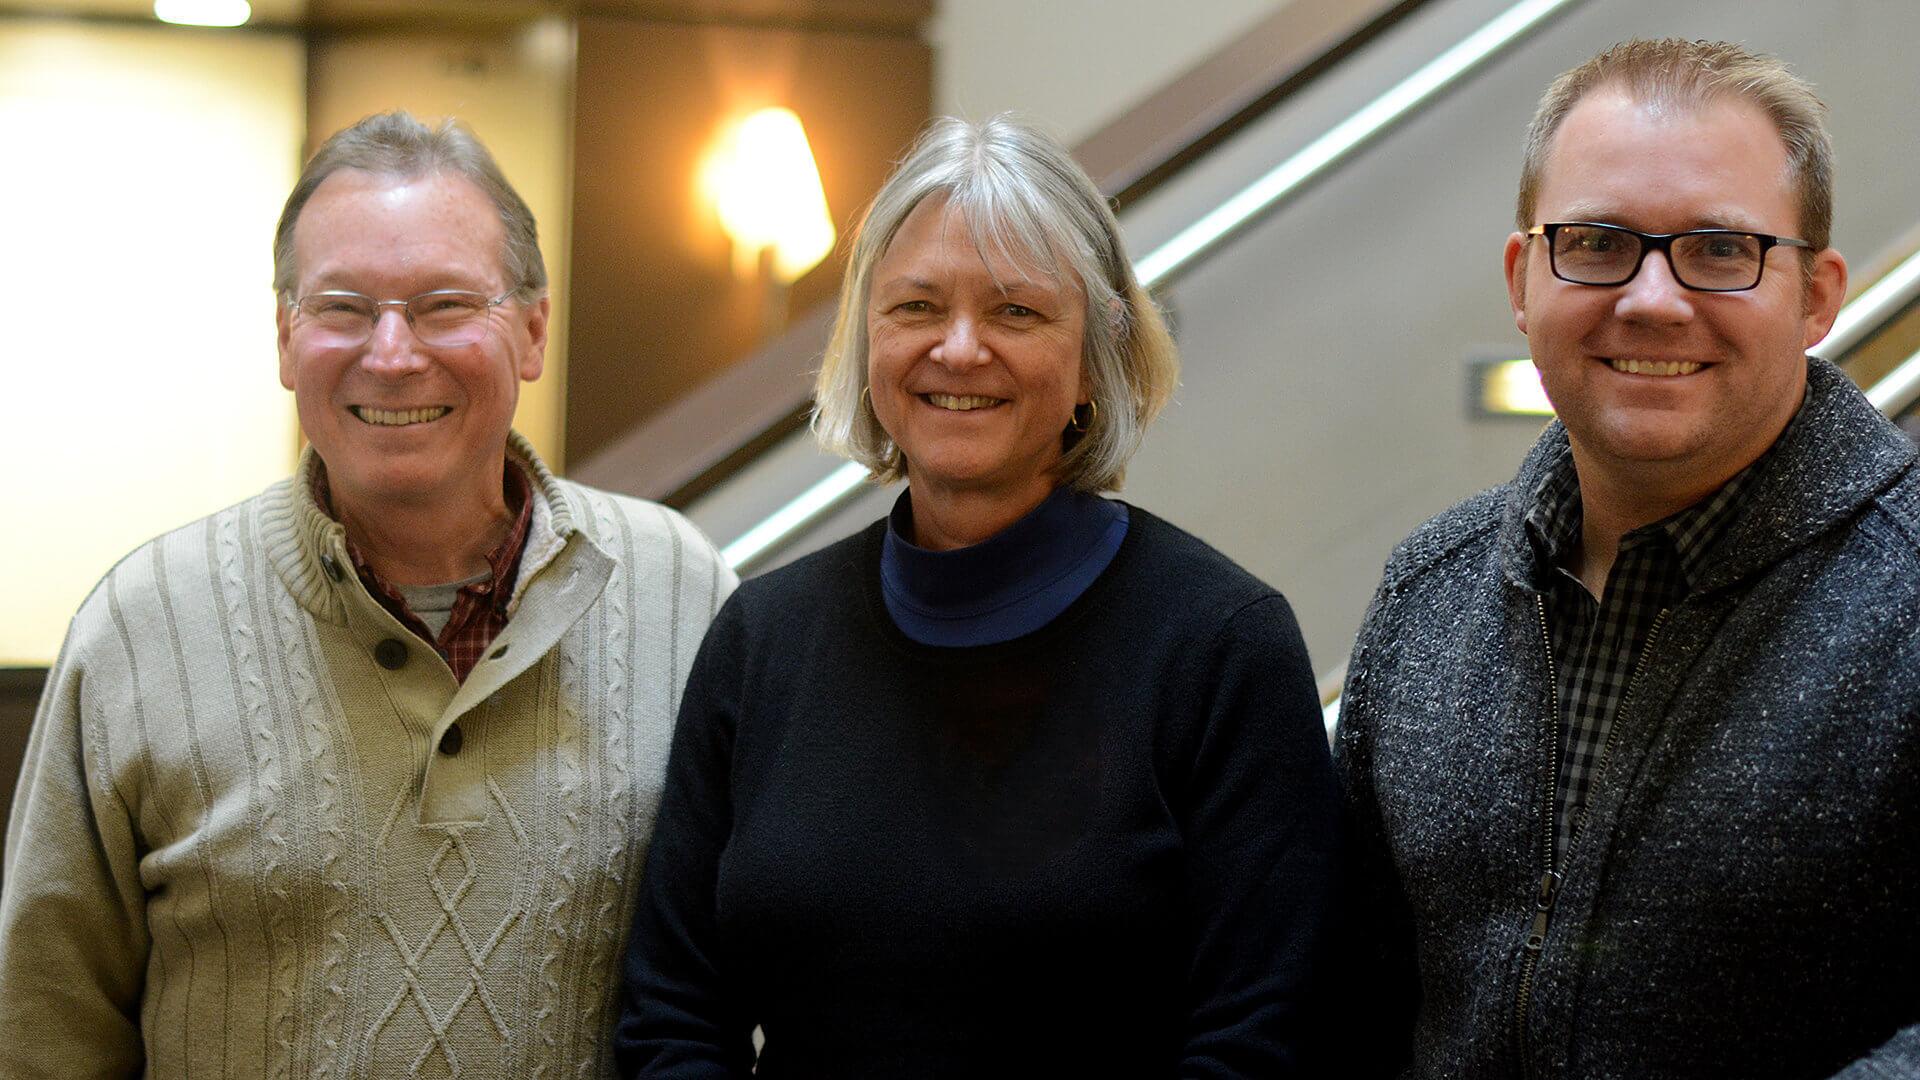 Voting membership elects new board of directors members